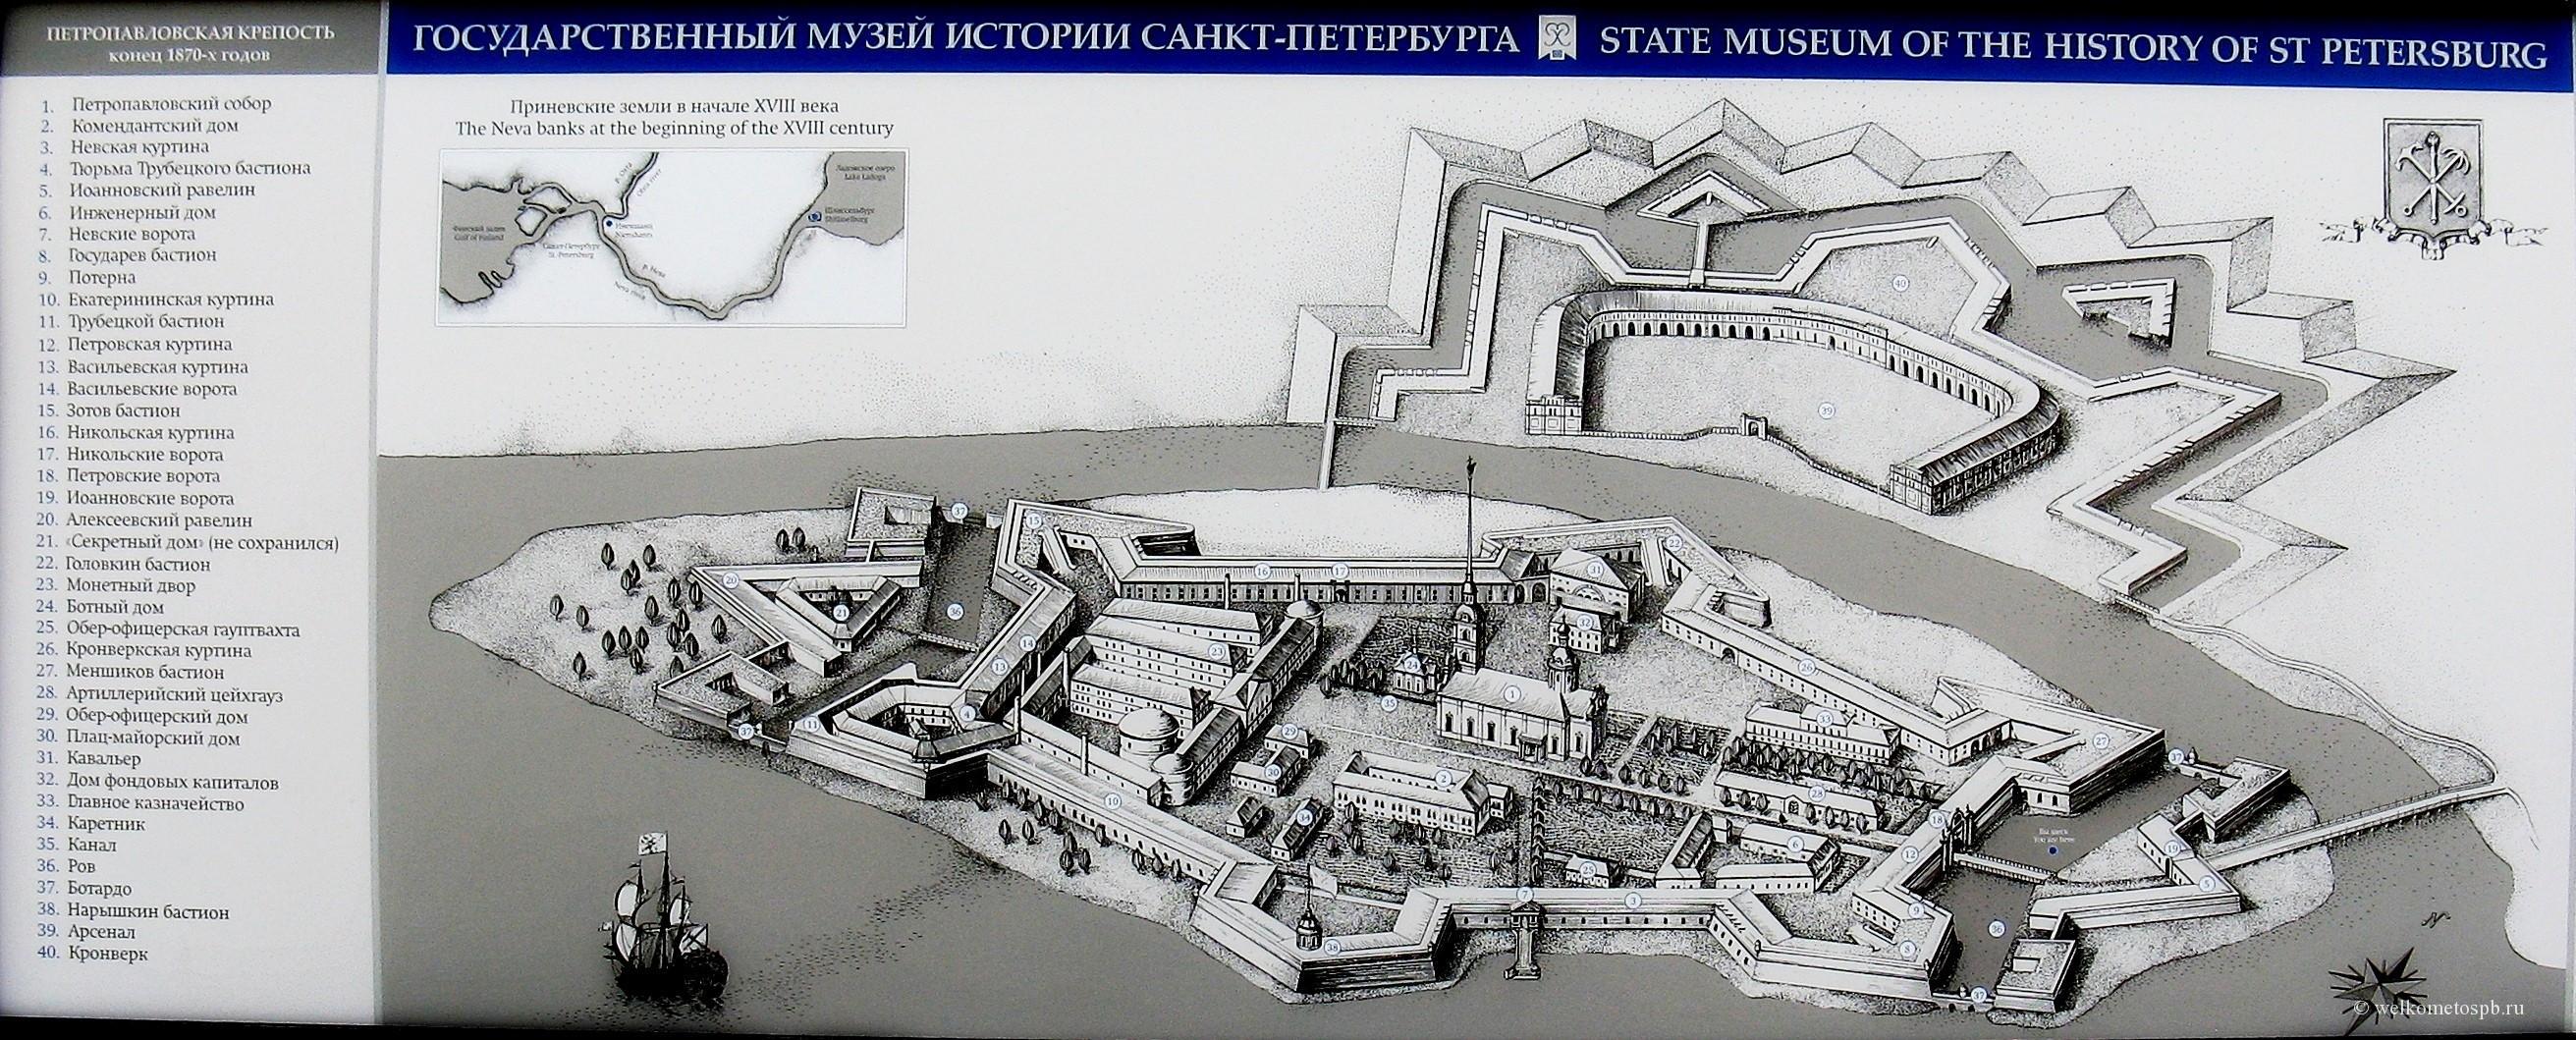 Istoric-Plan-Petropavl-krep-Full